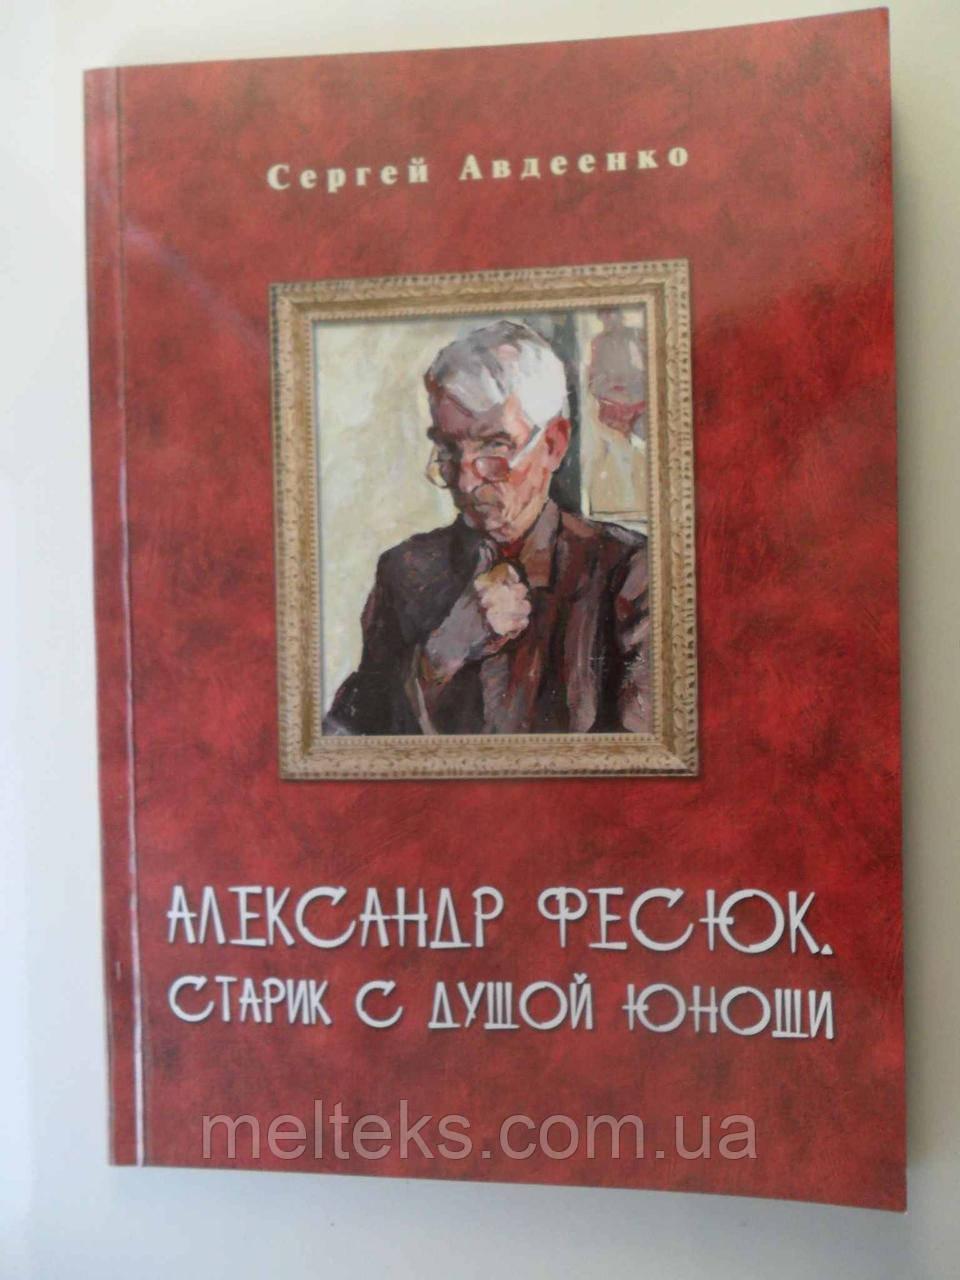 Александр Фесюк. Старик с душой юноши (книга Сергея Авдеенко)